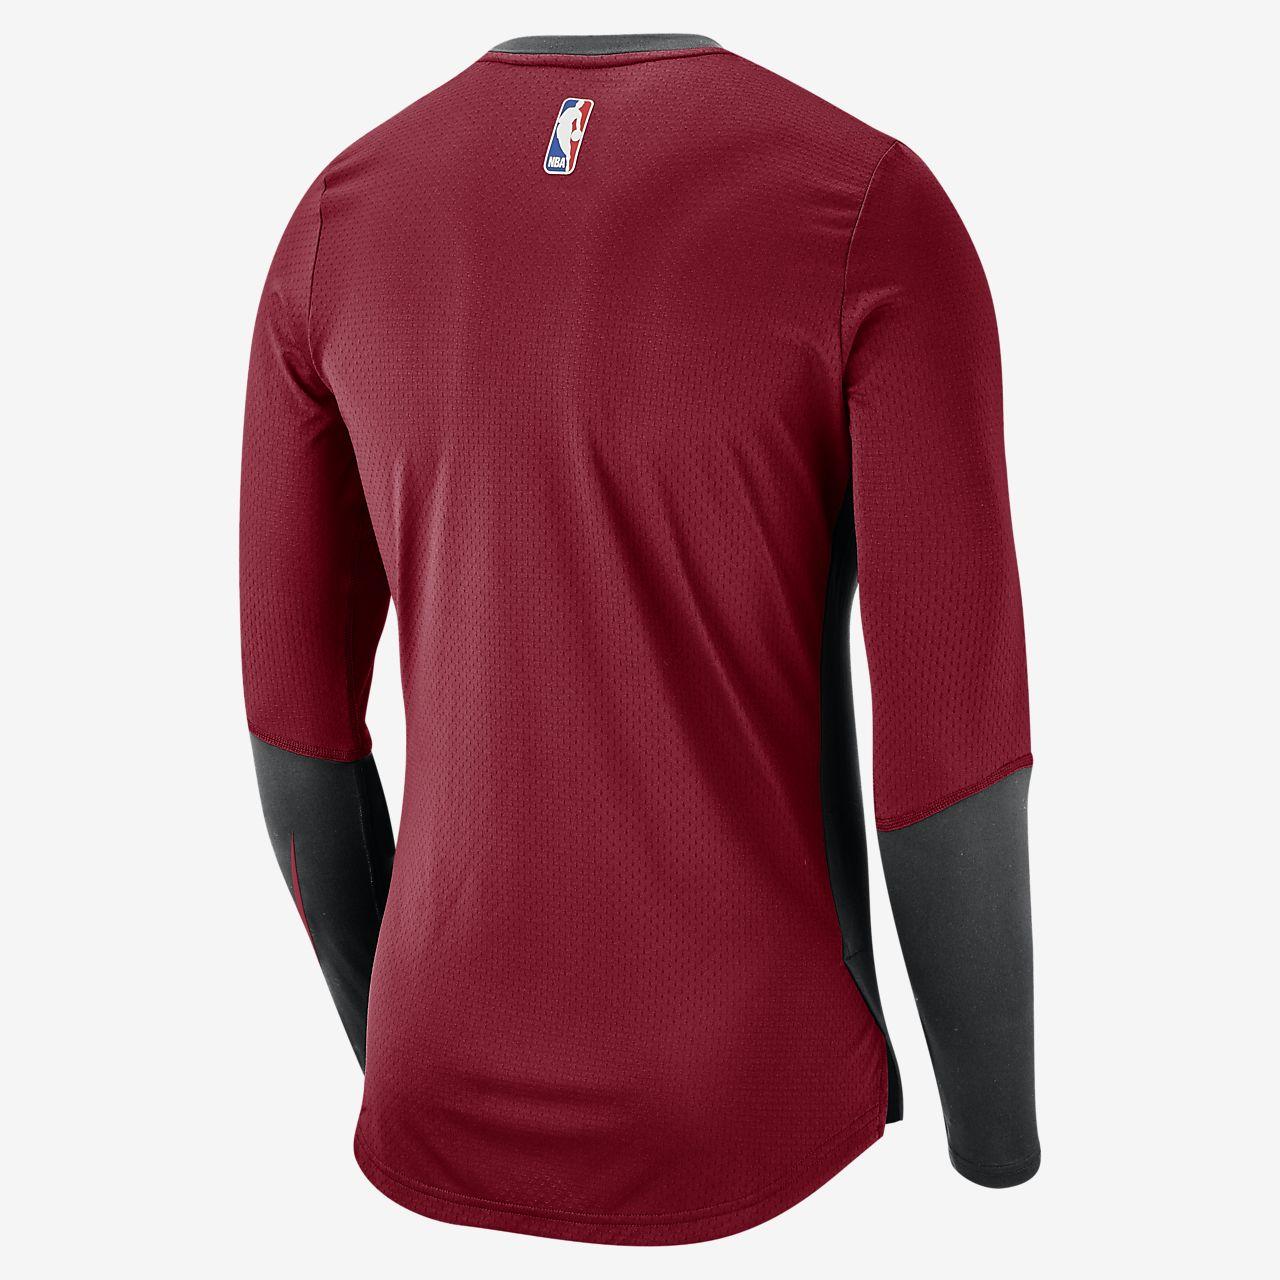 164f25aaf92 Miami Heat Nike Dri-FIT Men s Long-Sleeve NBA Top. Nike.com